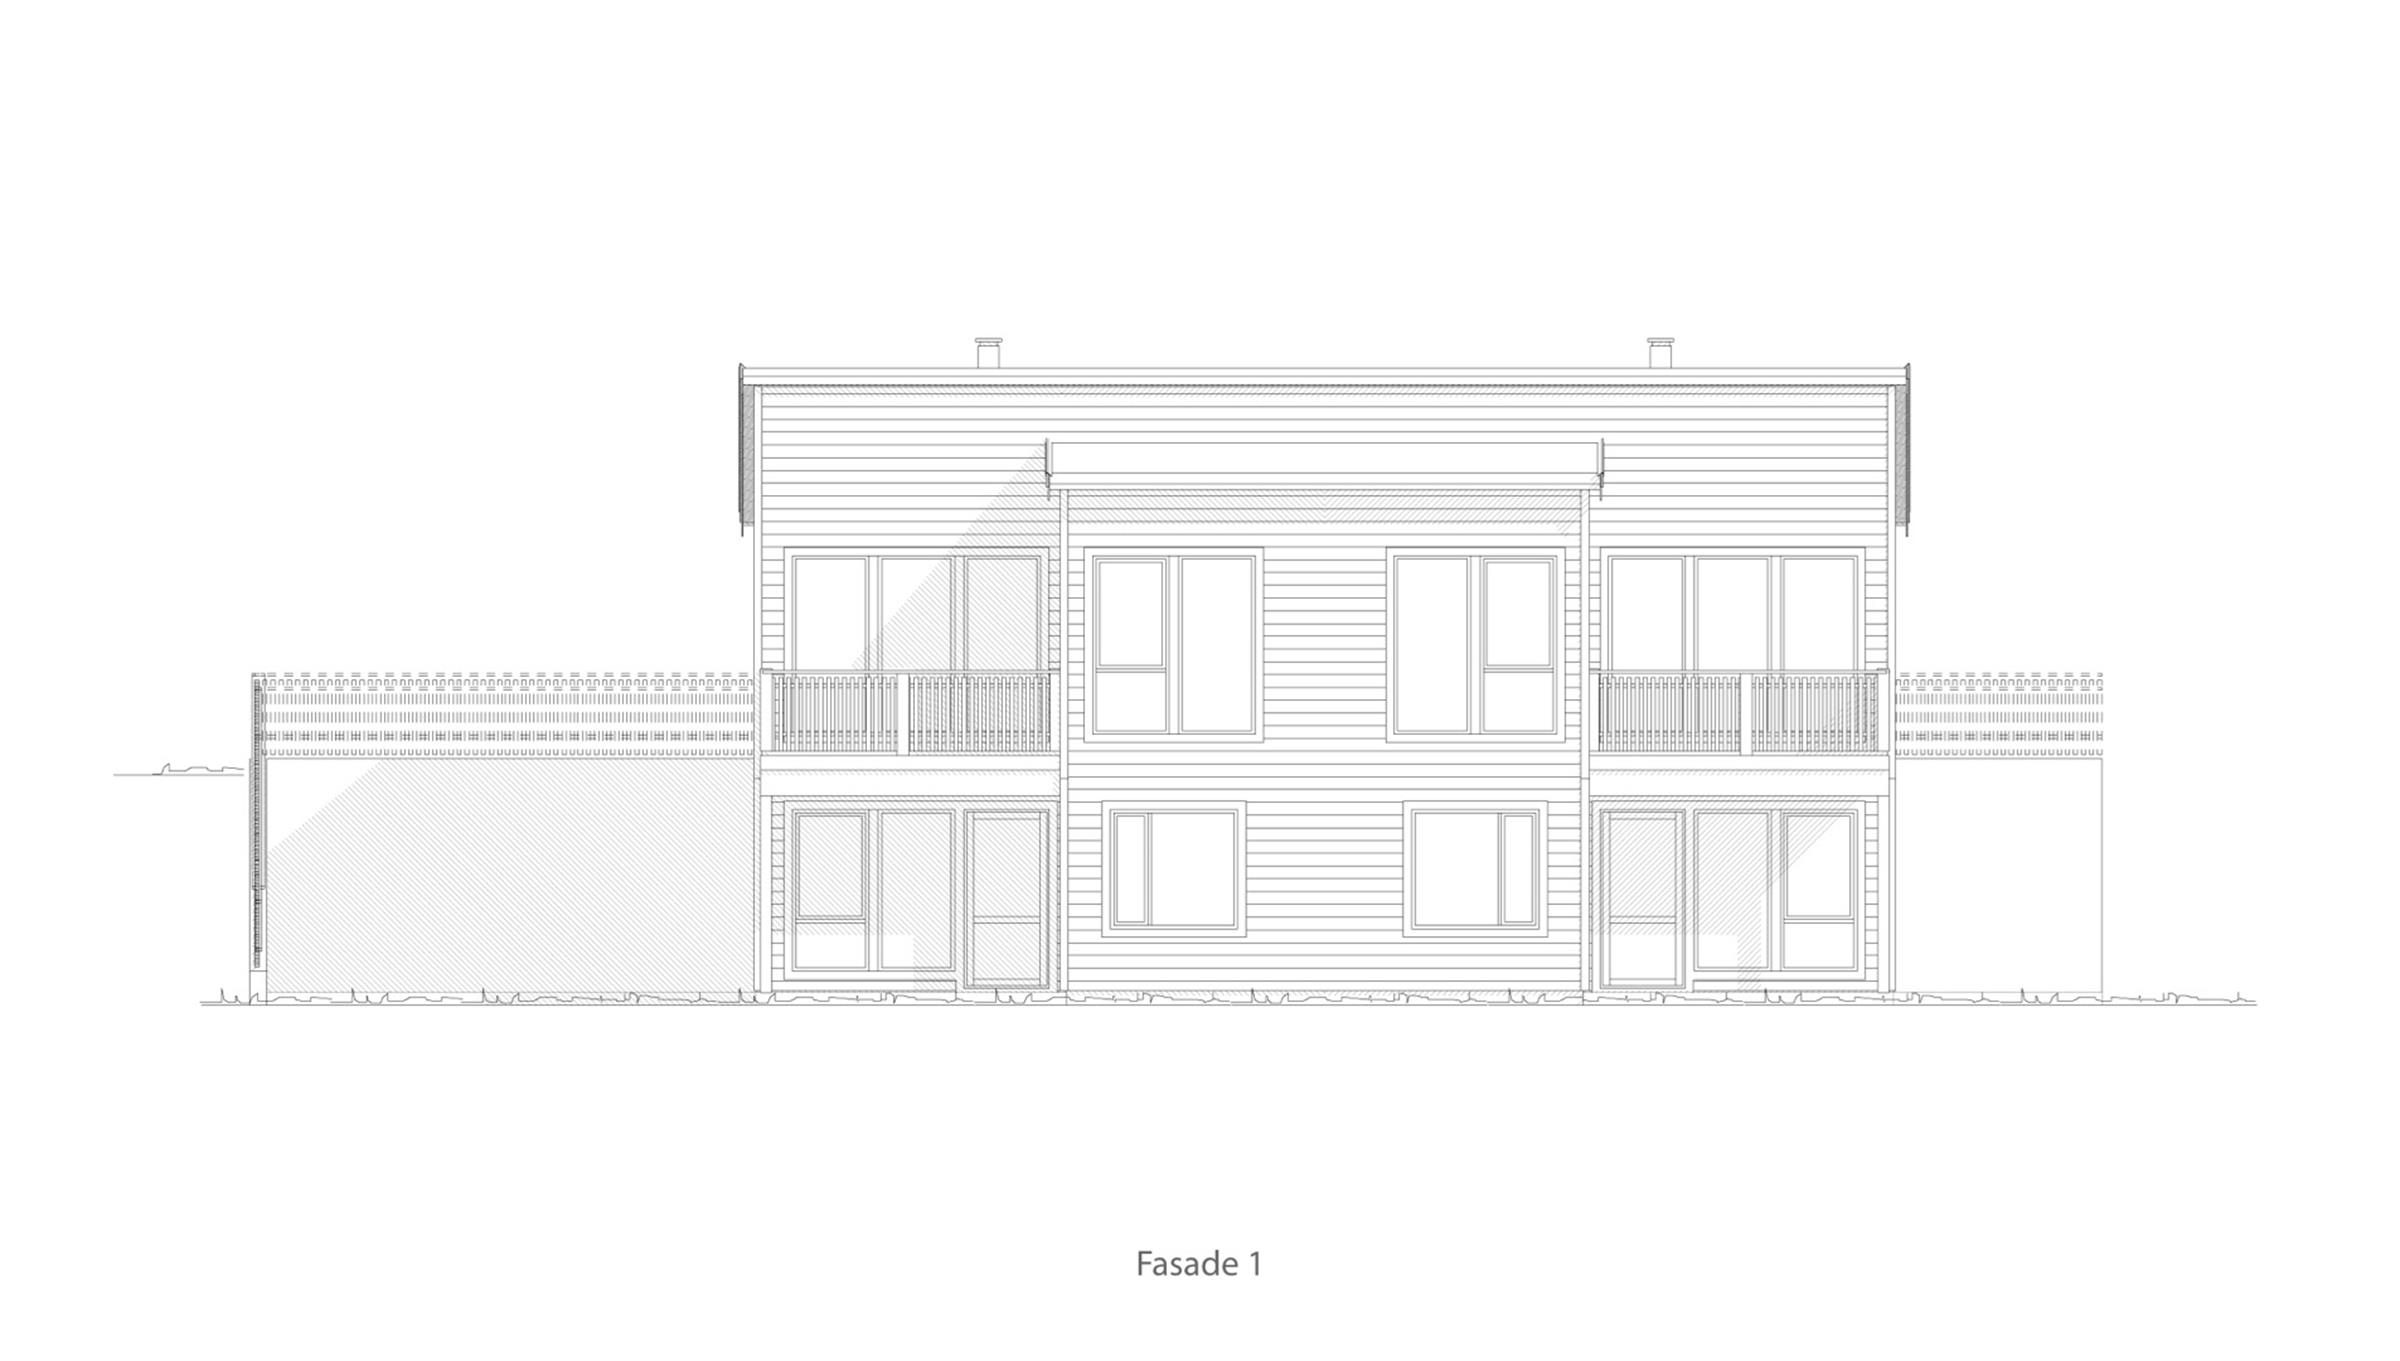 Bryne fasade 1